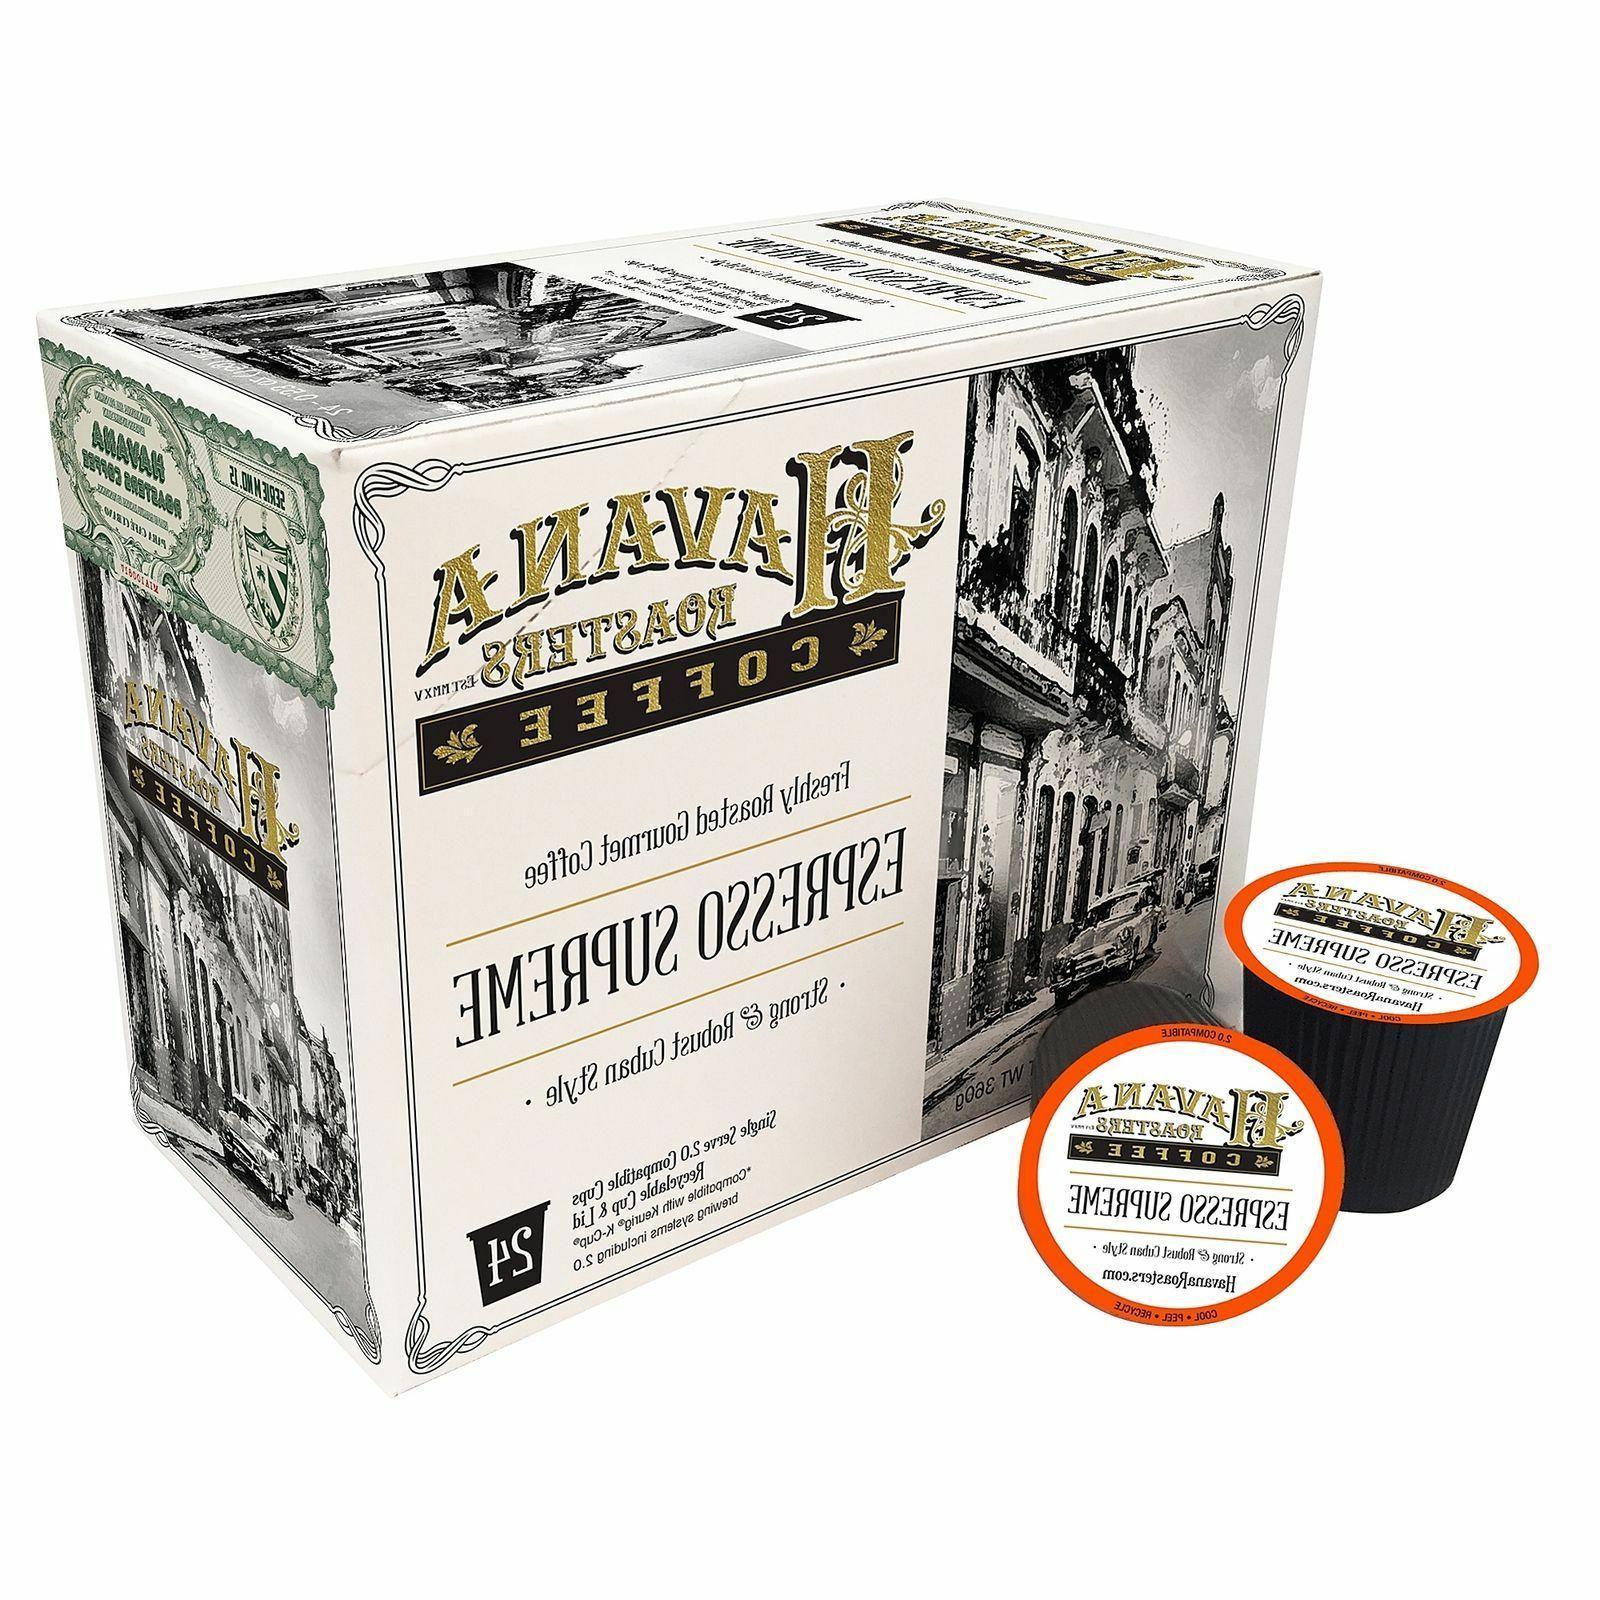 espresso supreme coffee 24 to 80 keurig